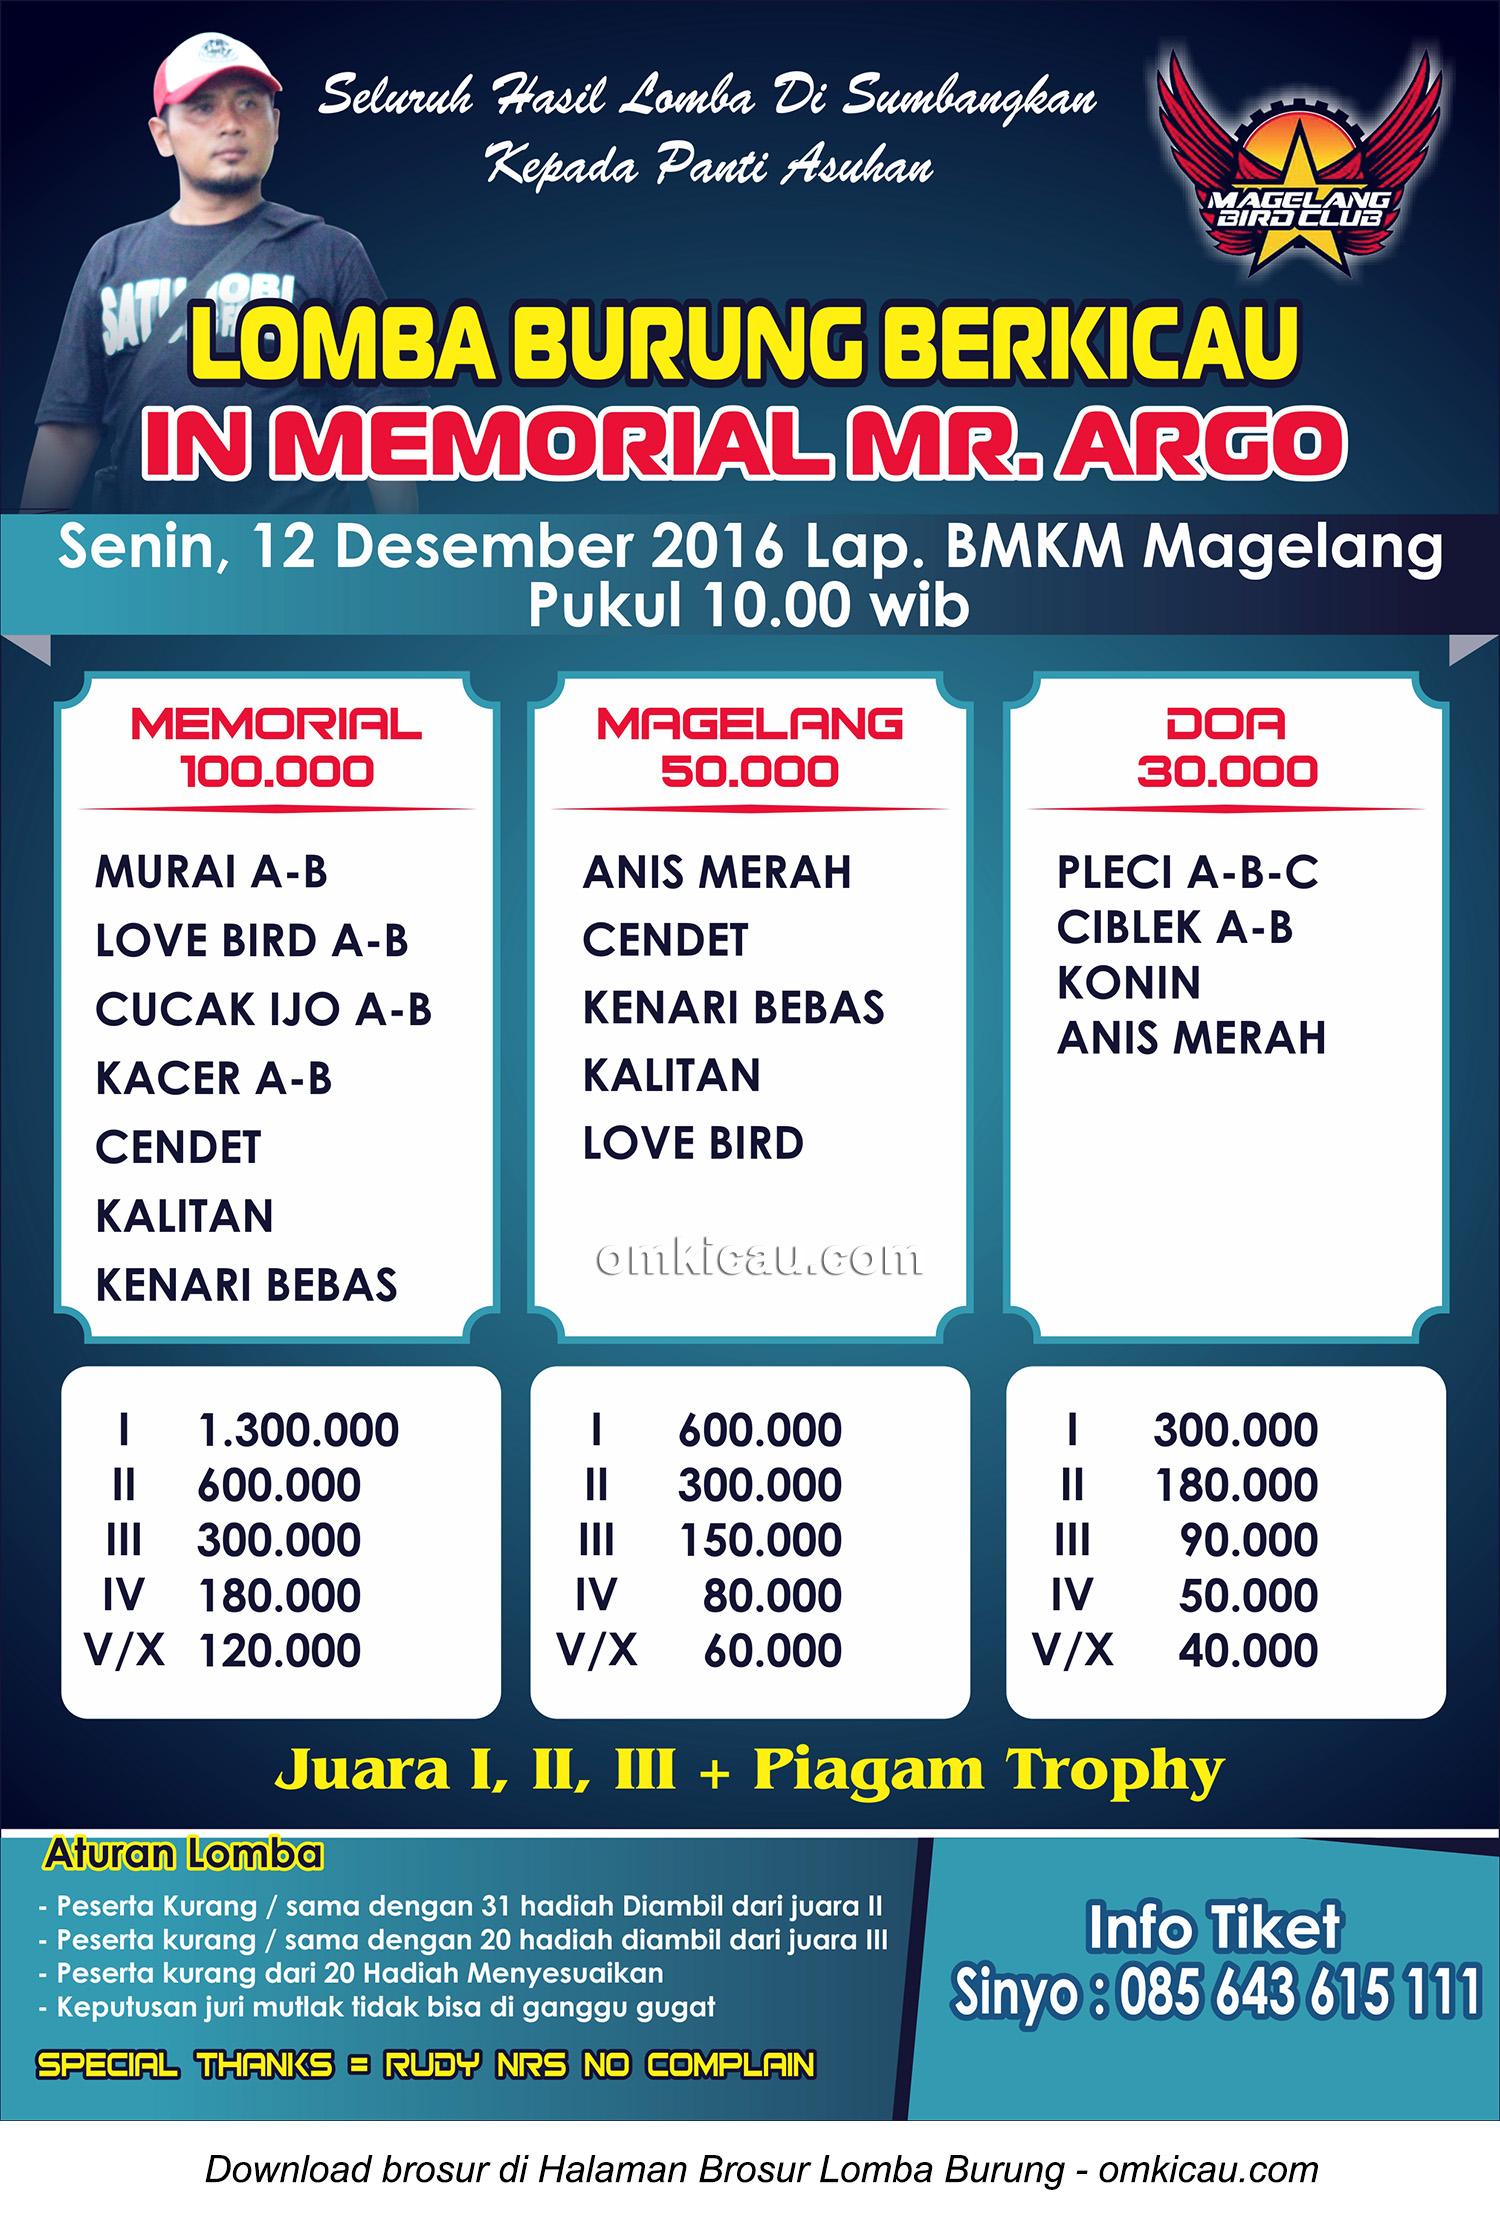 Brosur Lomba Burung Berkicau In Memorial Mr Argo, Magelang, 12 Desember 2016